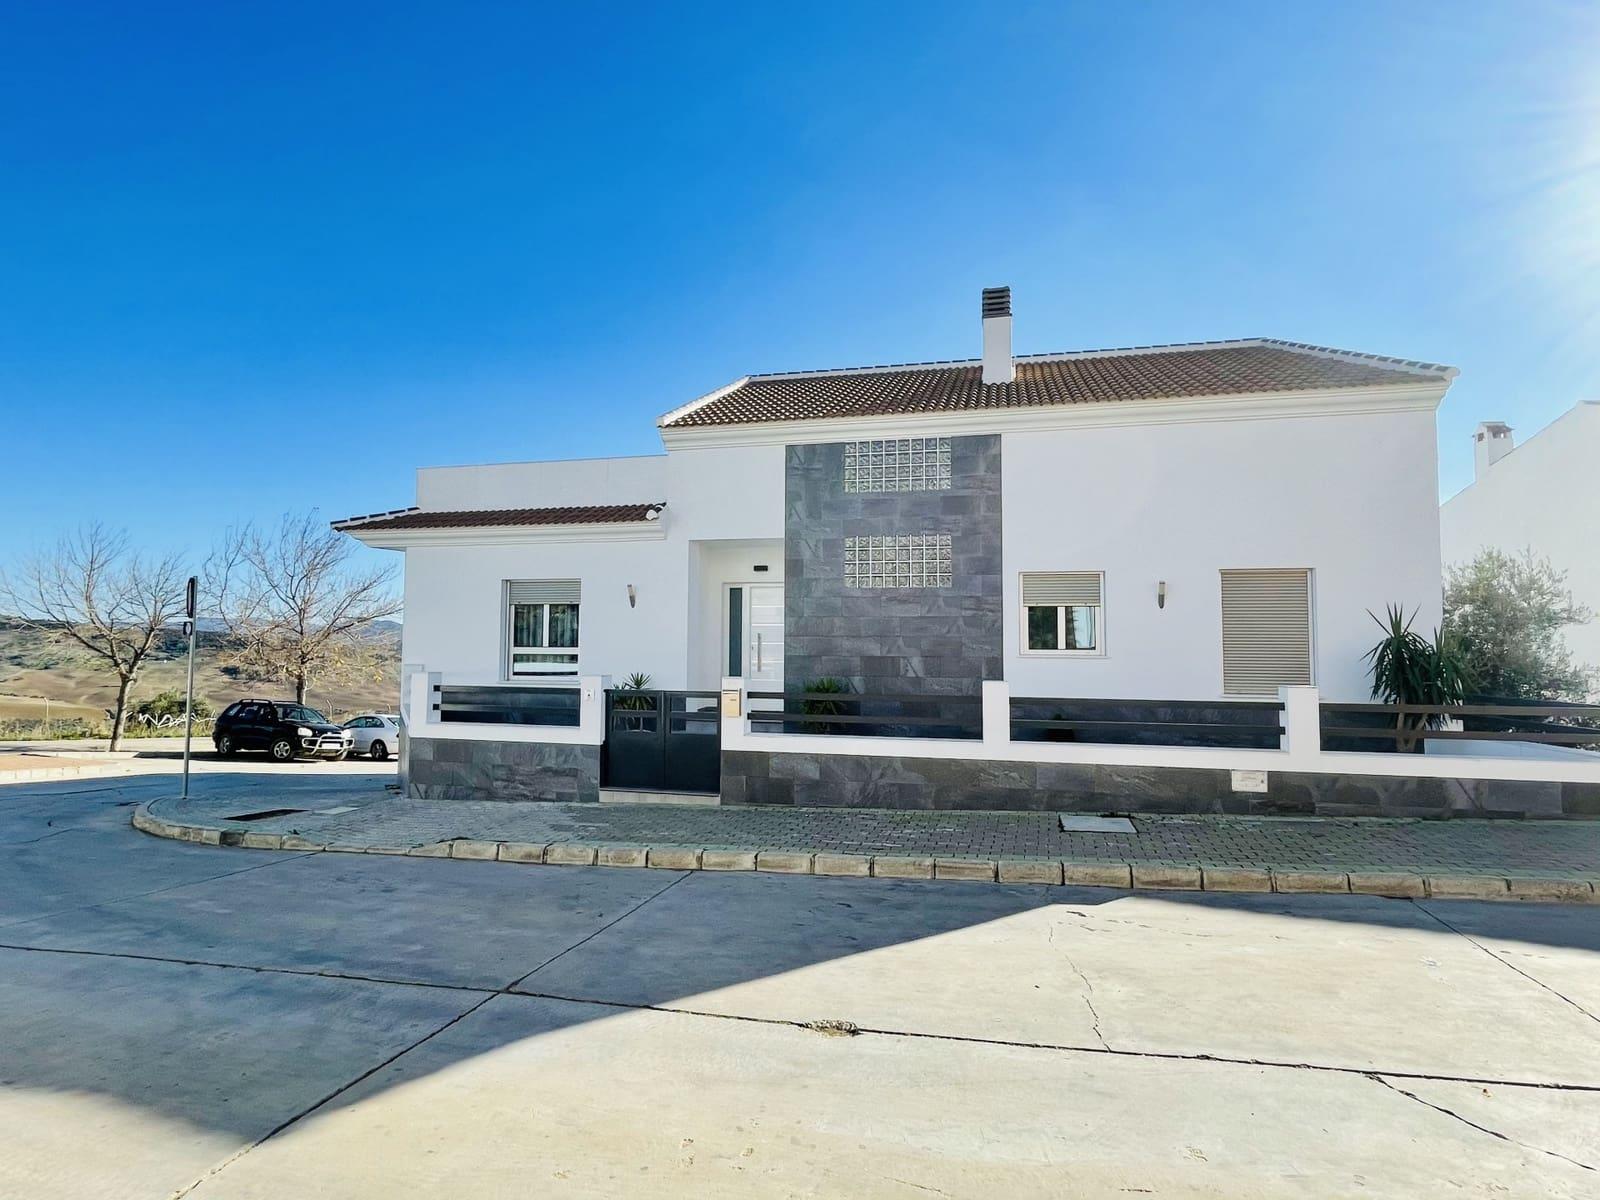 3 sypialnia Dom blizniak na sprzedaż w Villanueva de la Concepcion z basenem - 349 000 € (Ref: 5823795)